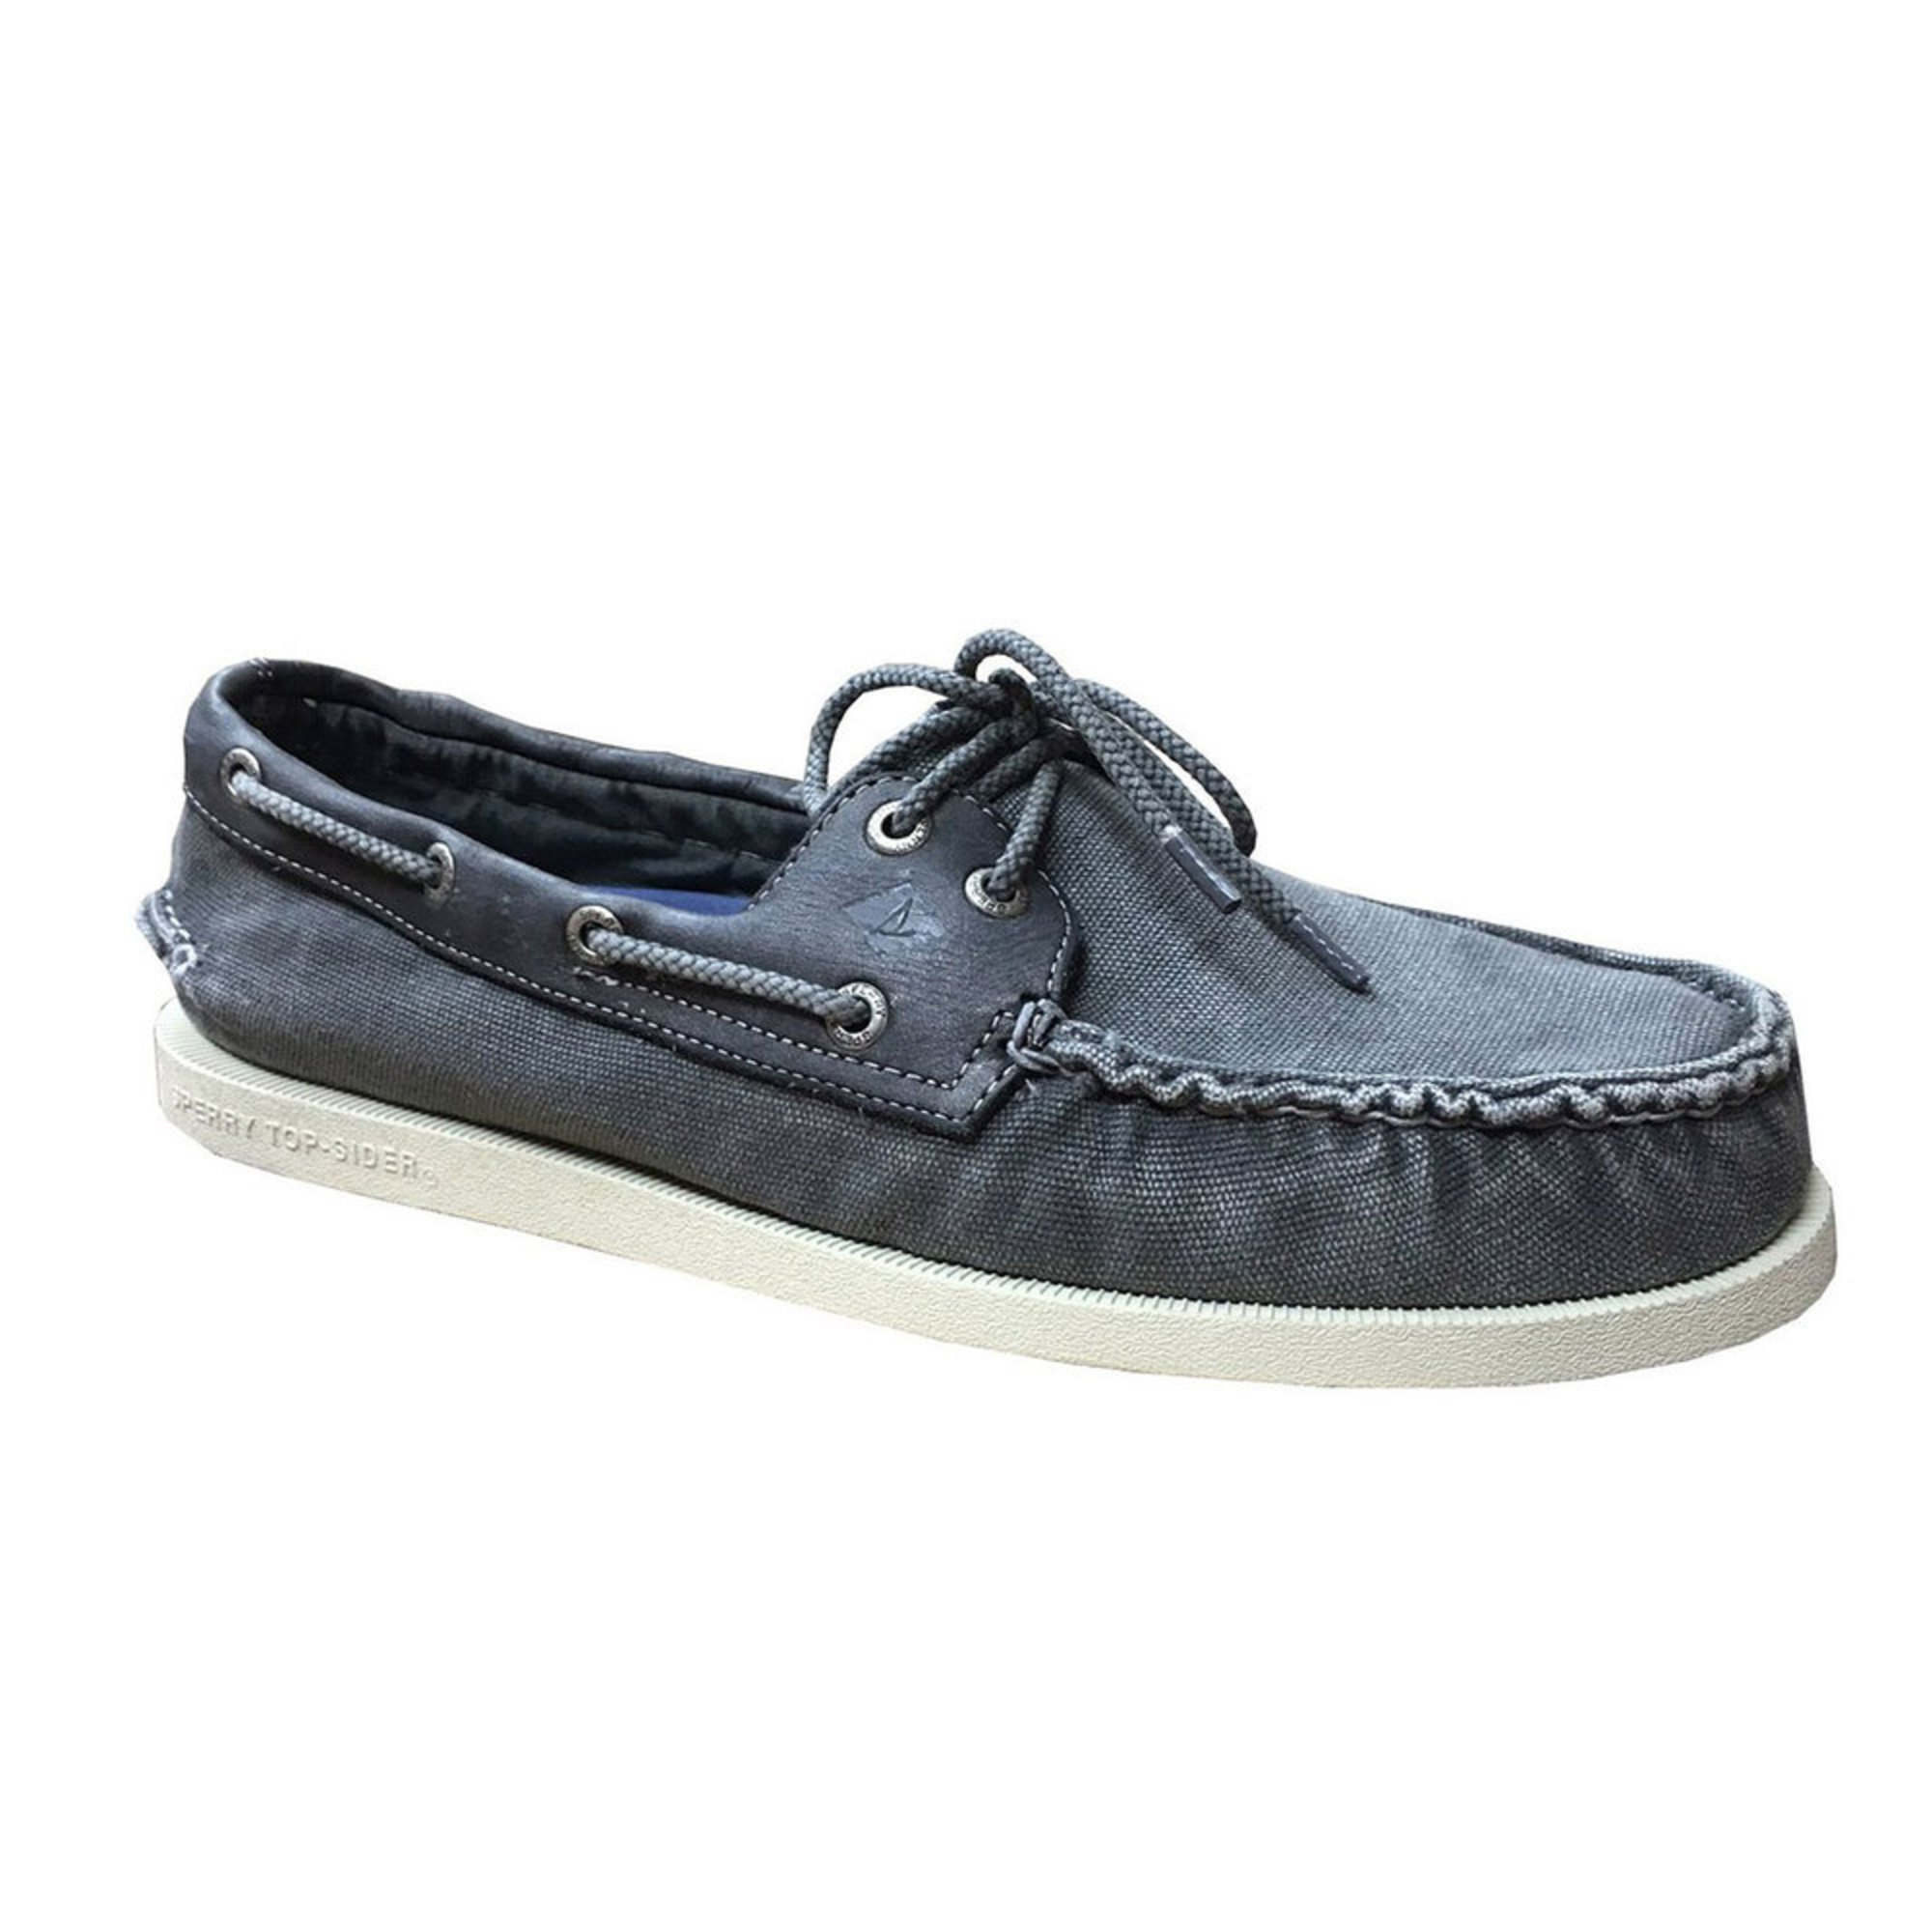 Sperry Top Sider Eye Wedge Men Boat Shoe Grey Shoes